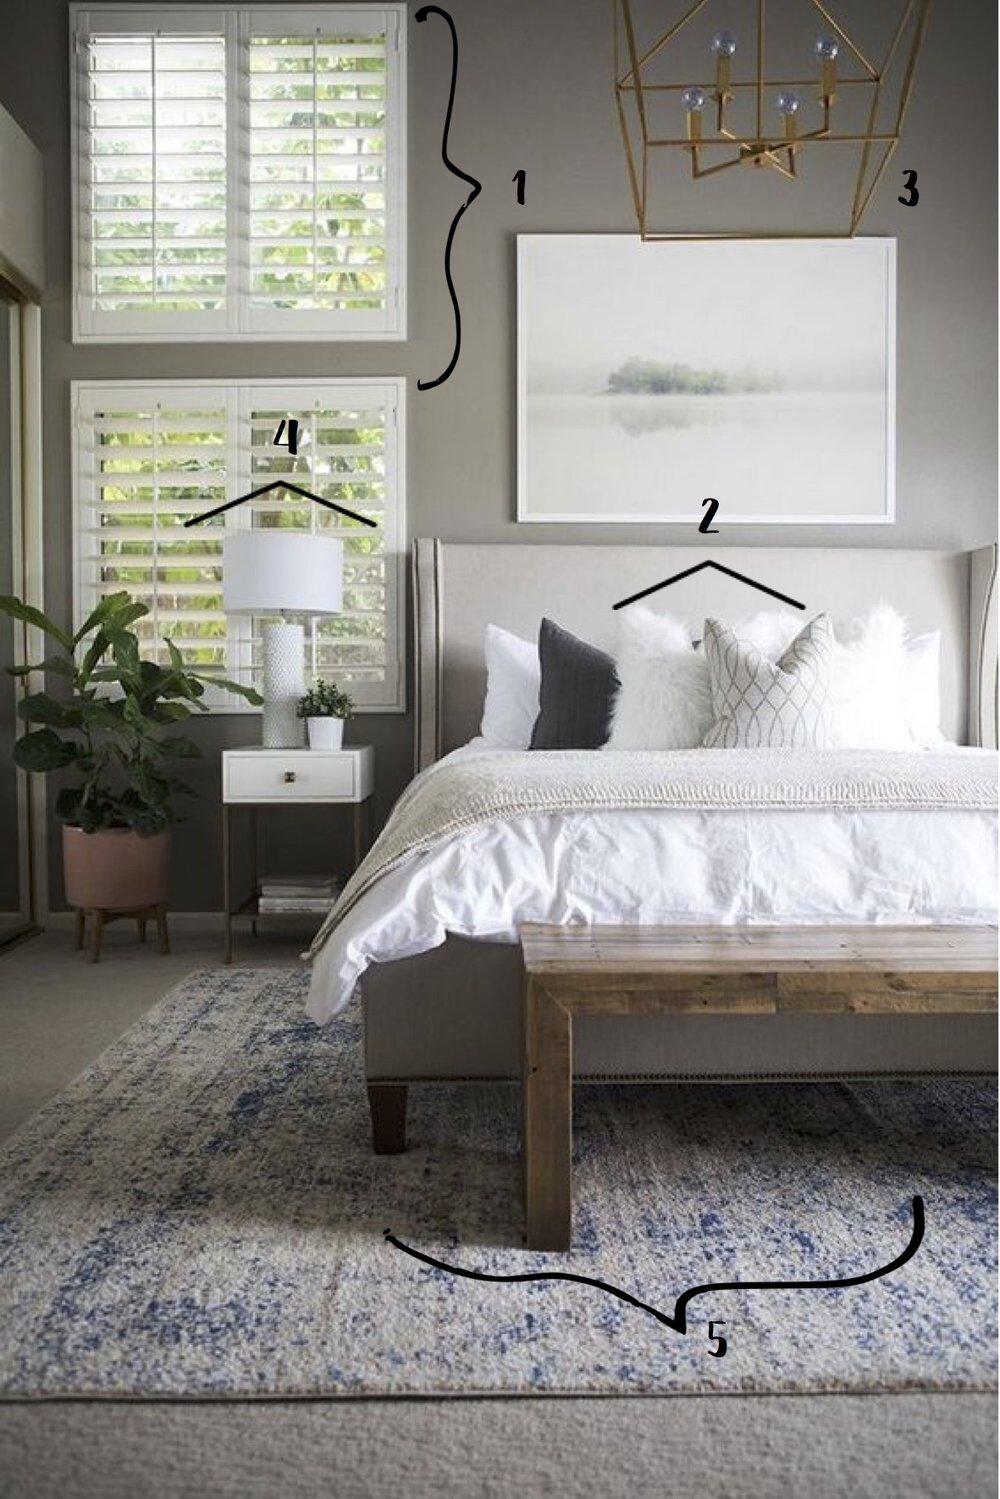 bedroom staging. Personal Staycation: Tips For Staging The Master Bedroom \u2014 Amanda\u0027s House Of Elegance